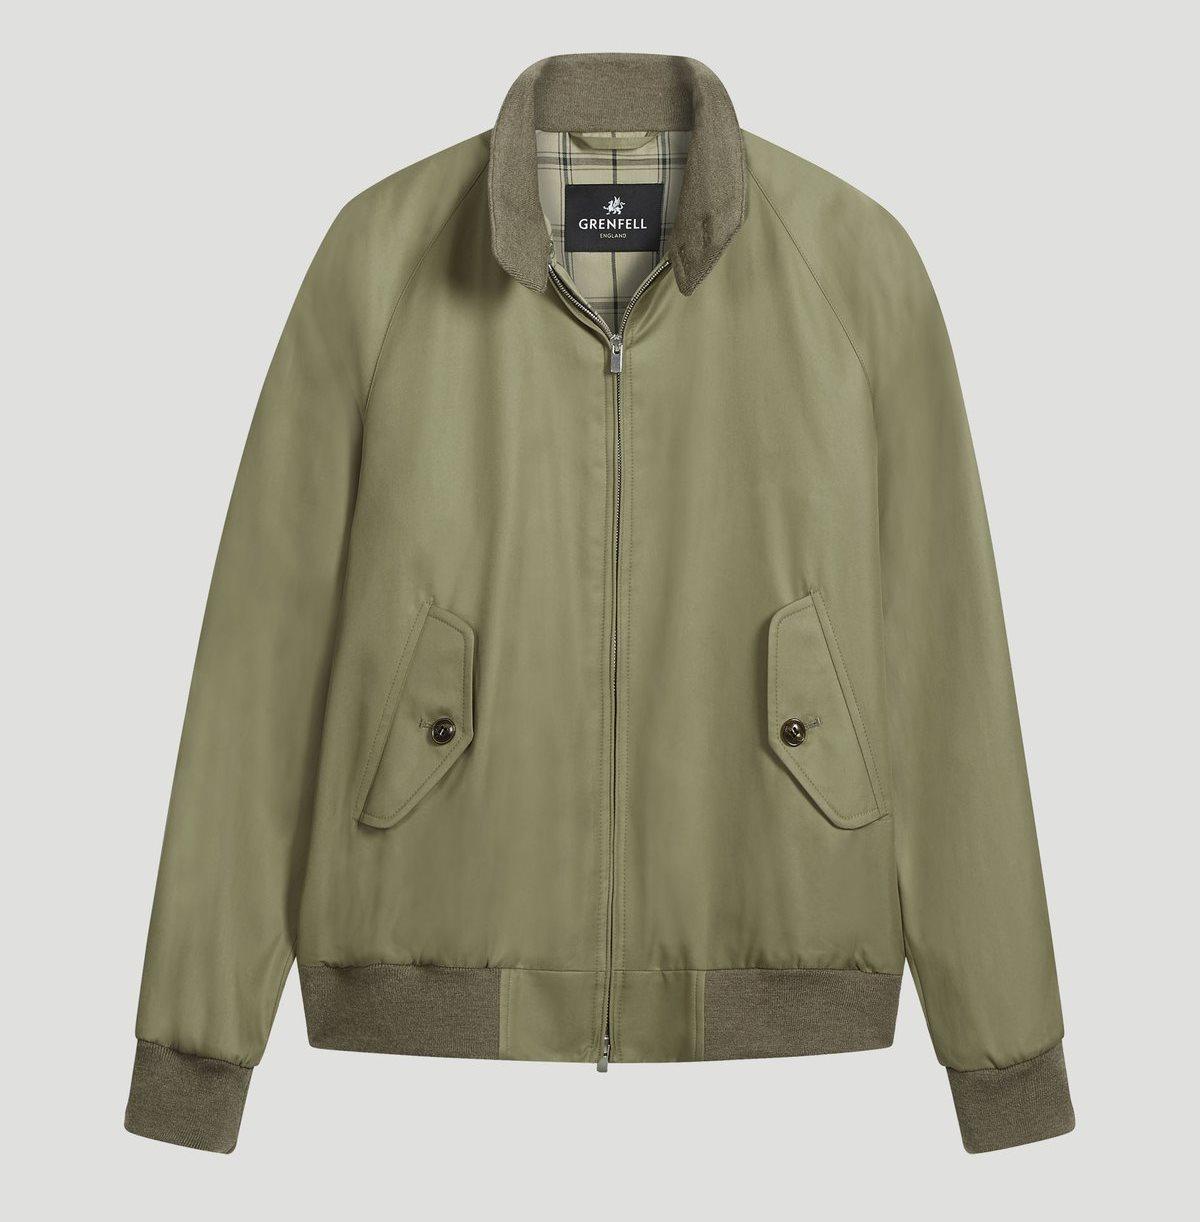 Glenfell jacket